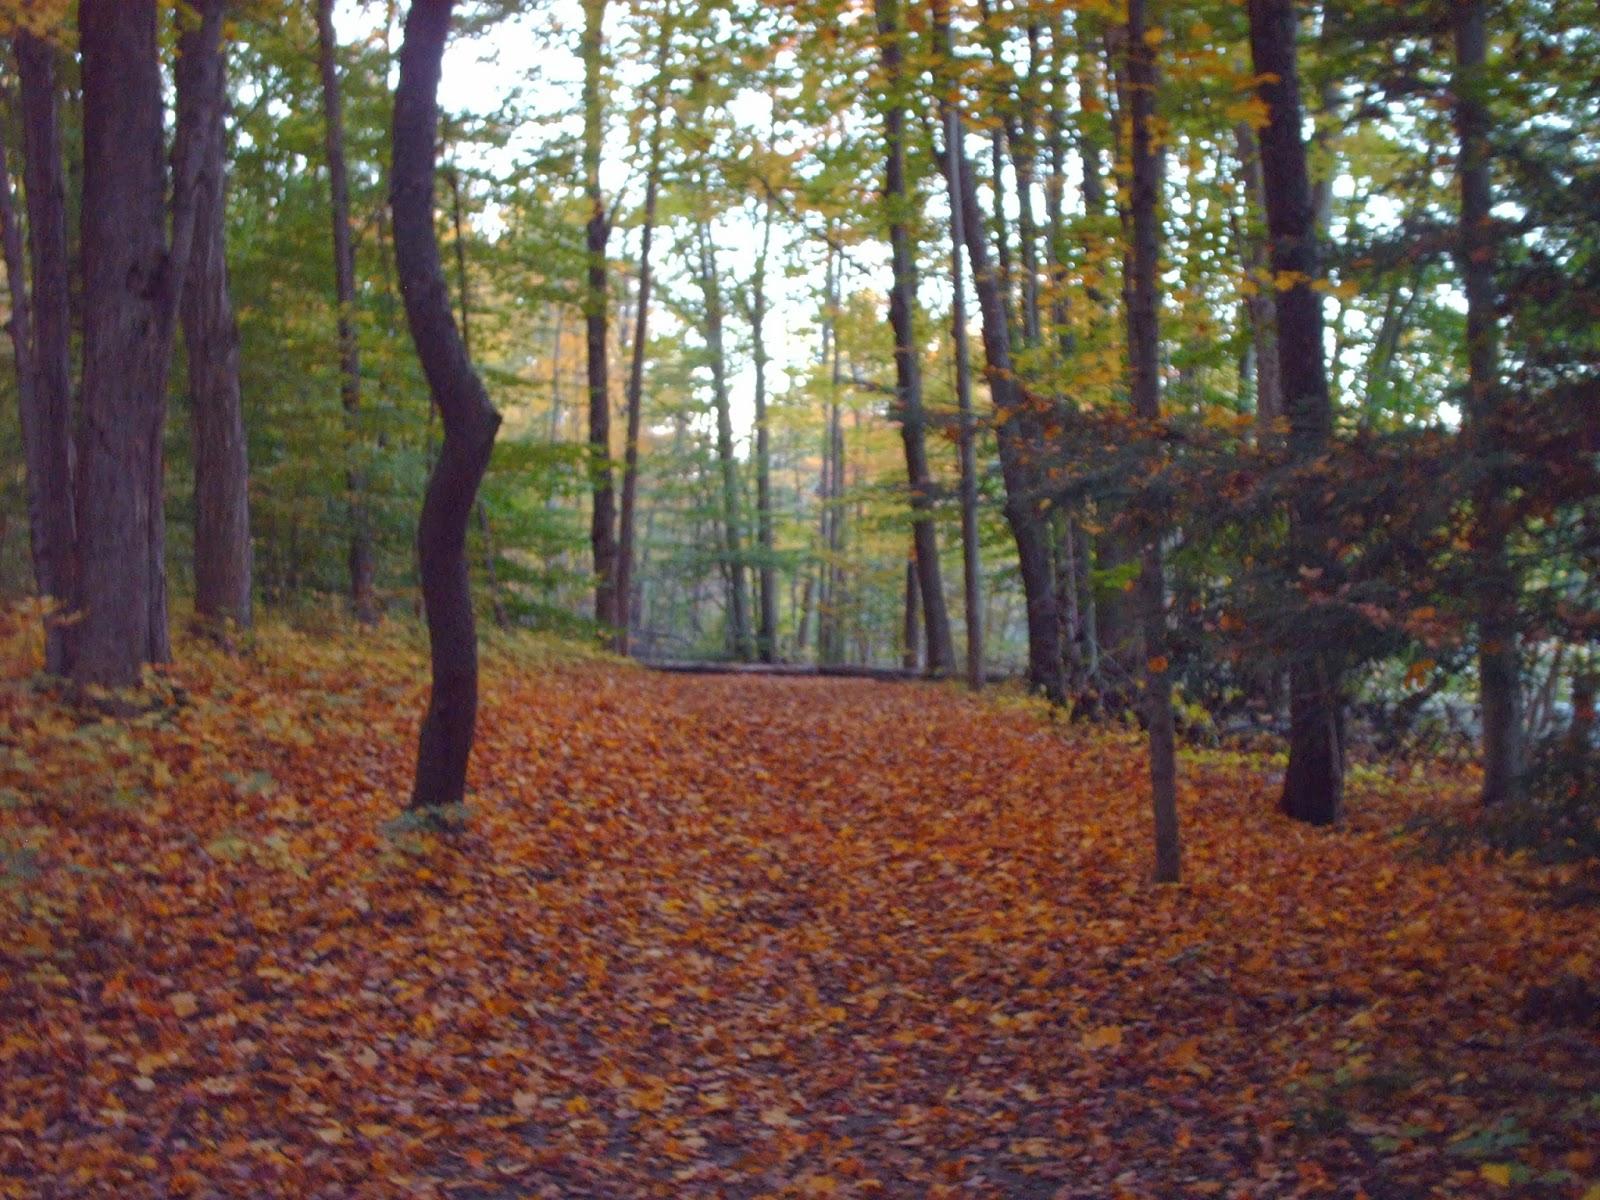 Leaf-covered Vansittart Woods path